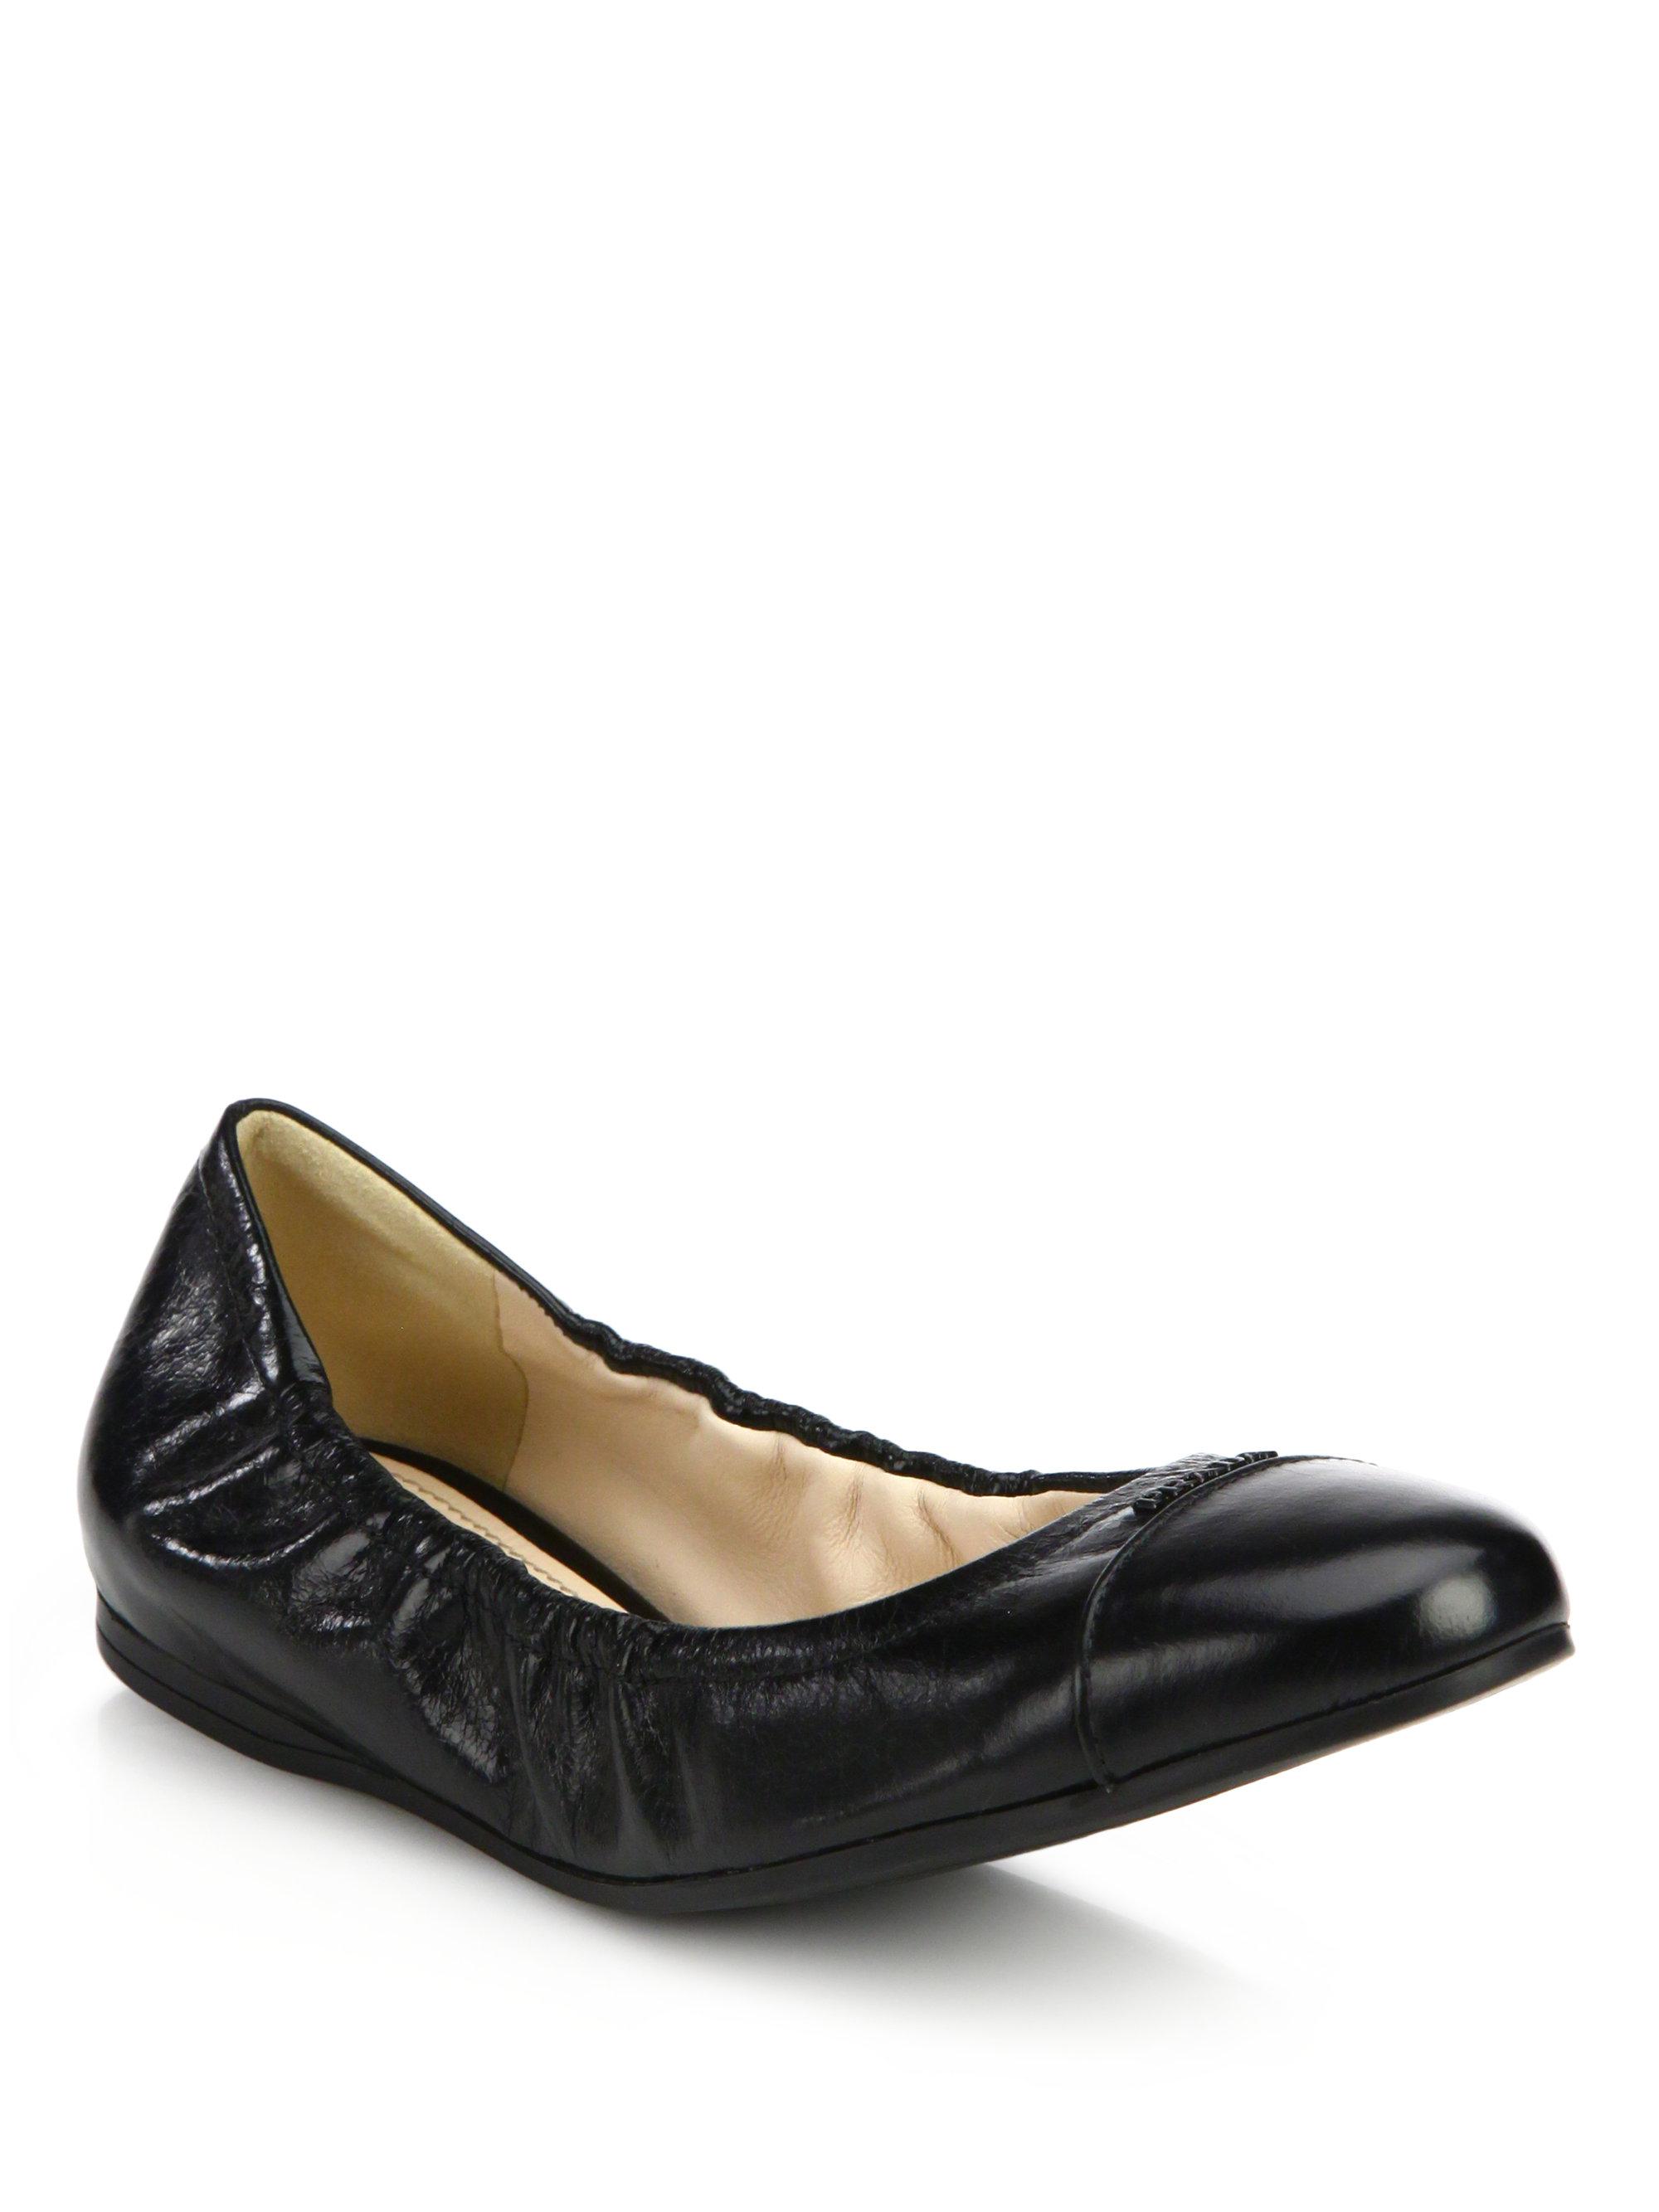 Prada Leather Cap-Toe Ballet Flats in